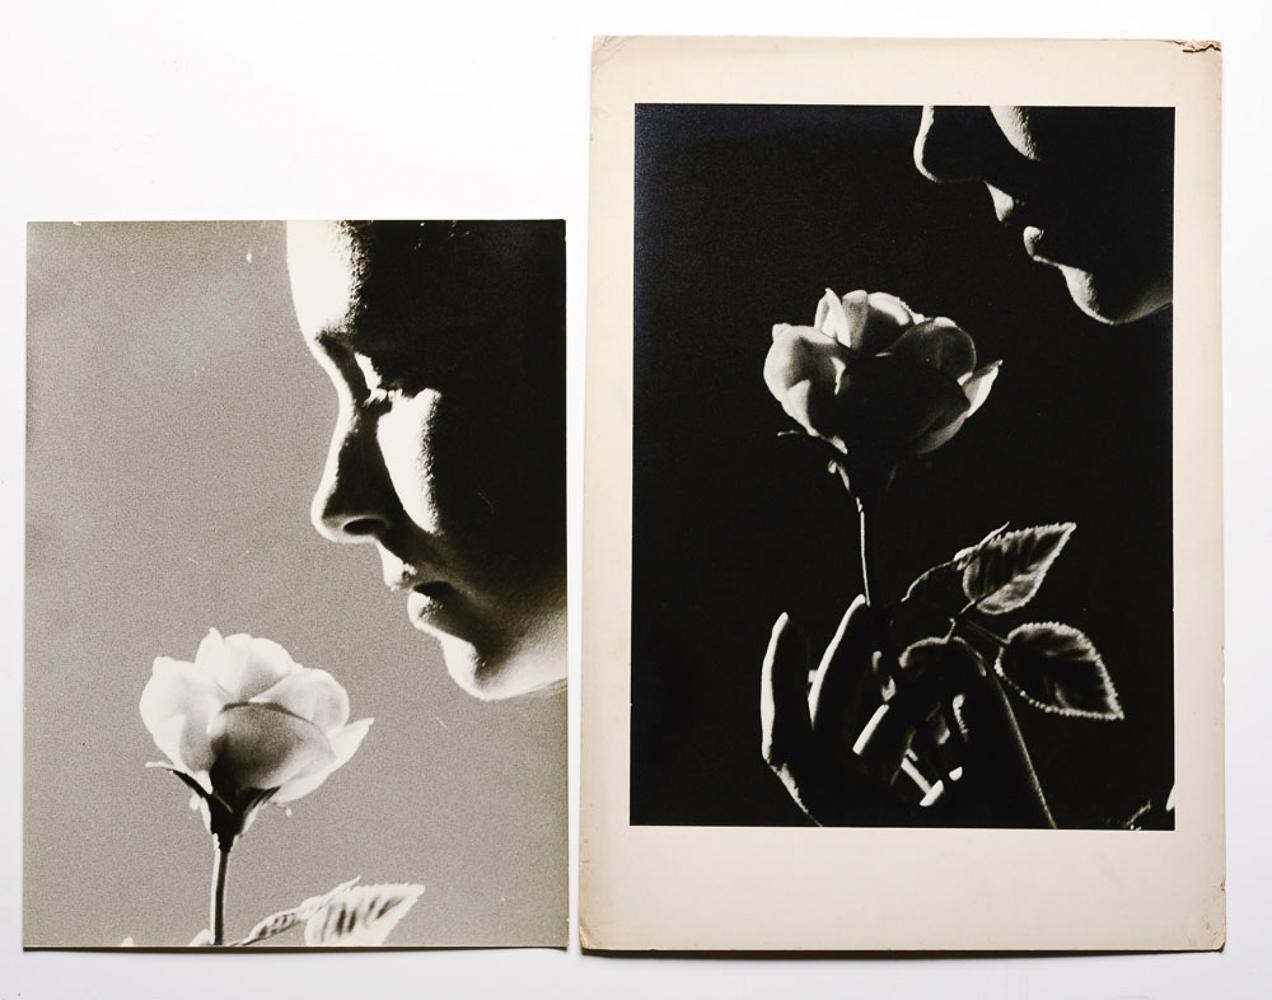 2 black and white photographs, 50 x 35.5 cm.